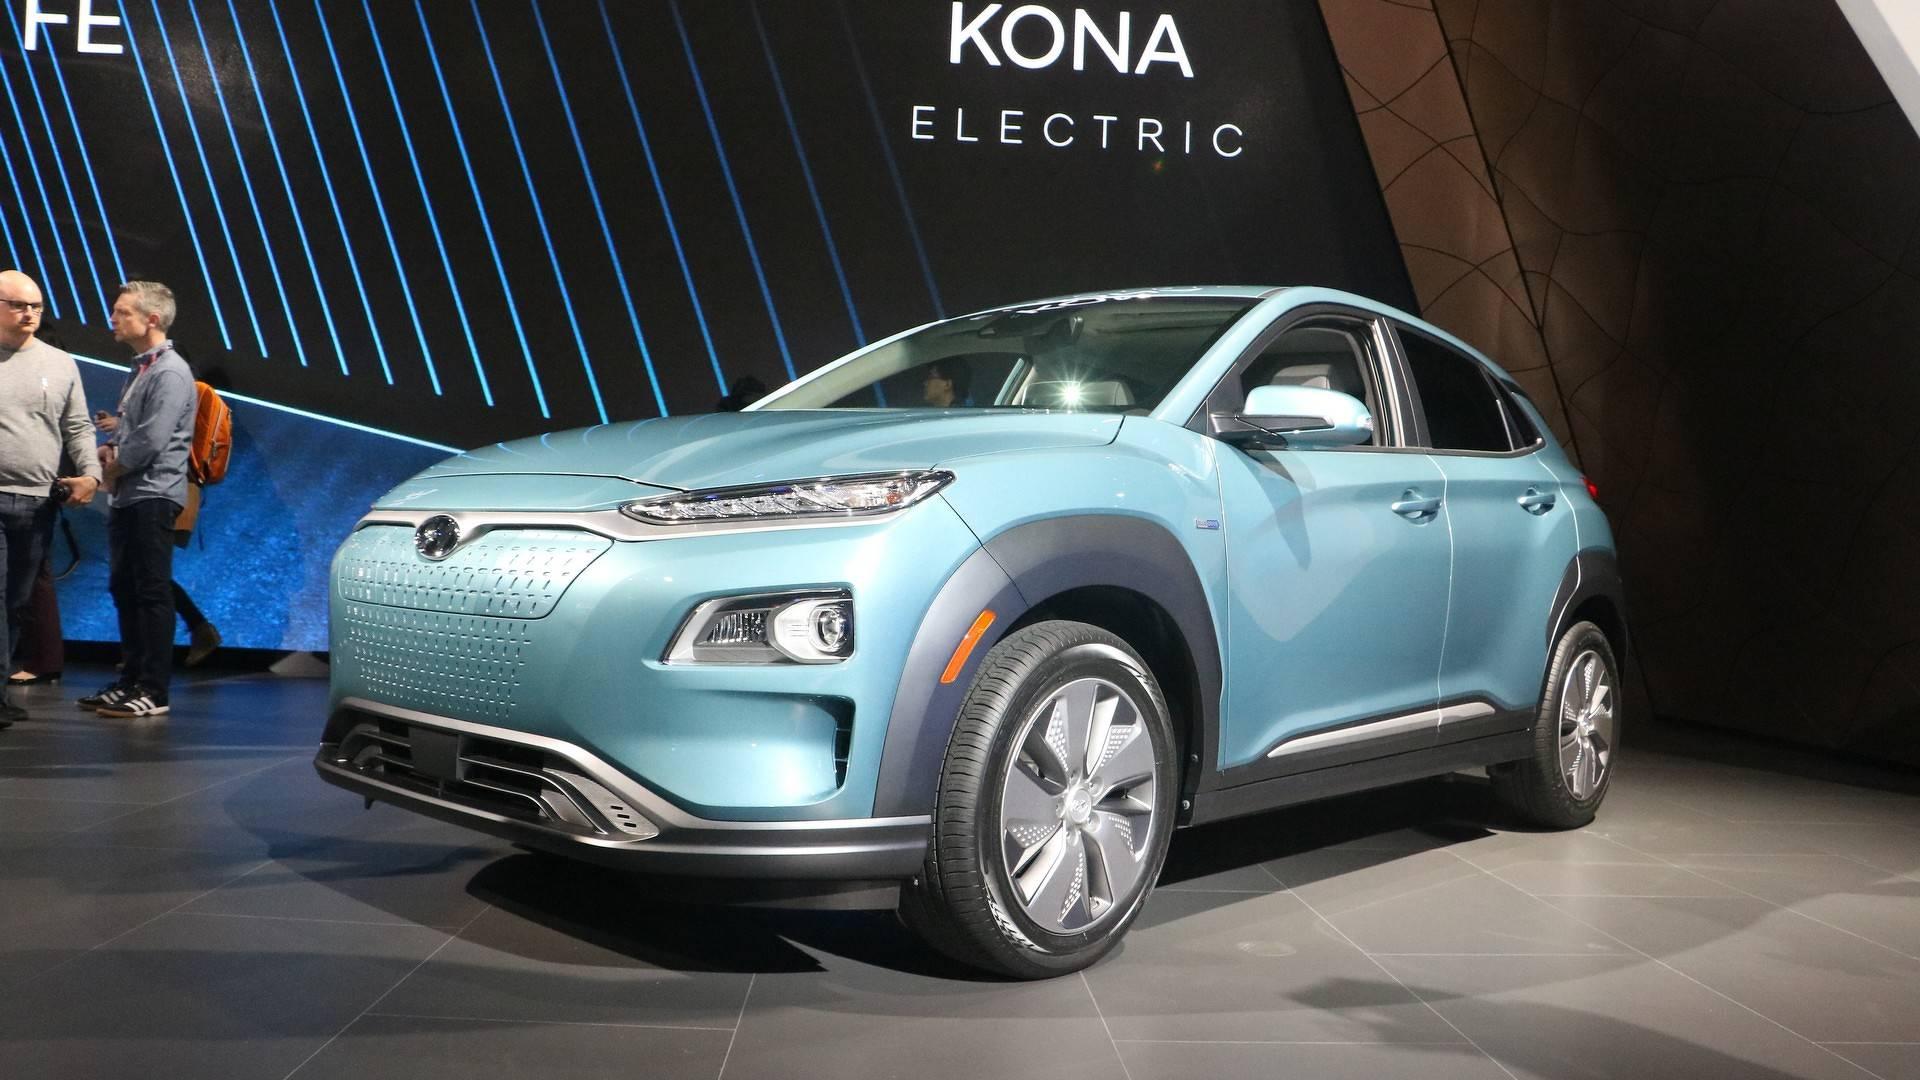 2019 Hyundai Kona Electric Has 250 Miles Of Range